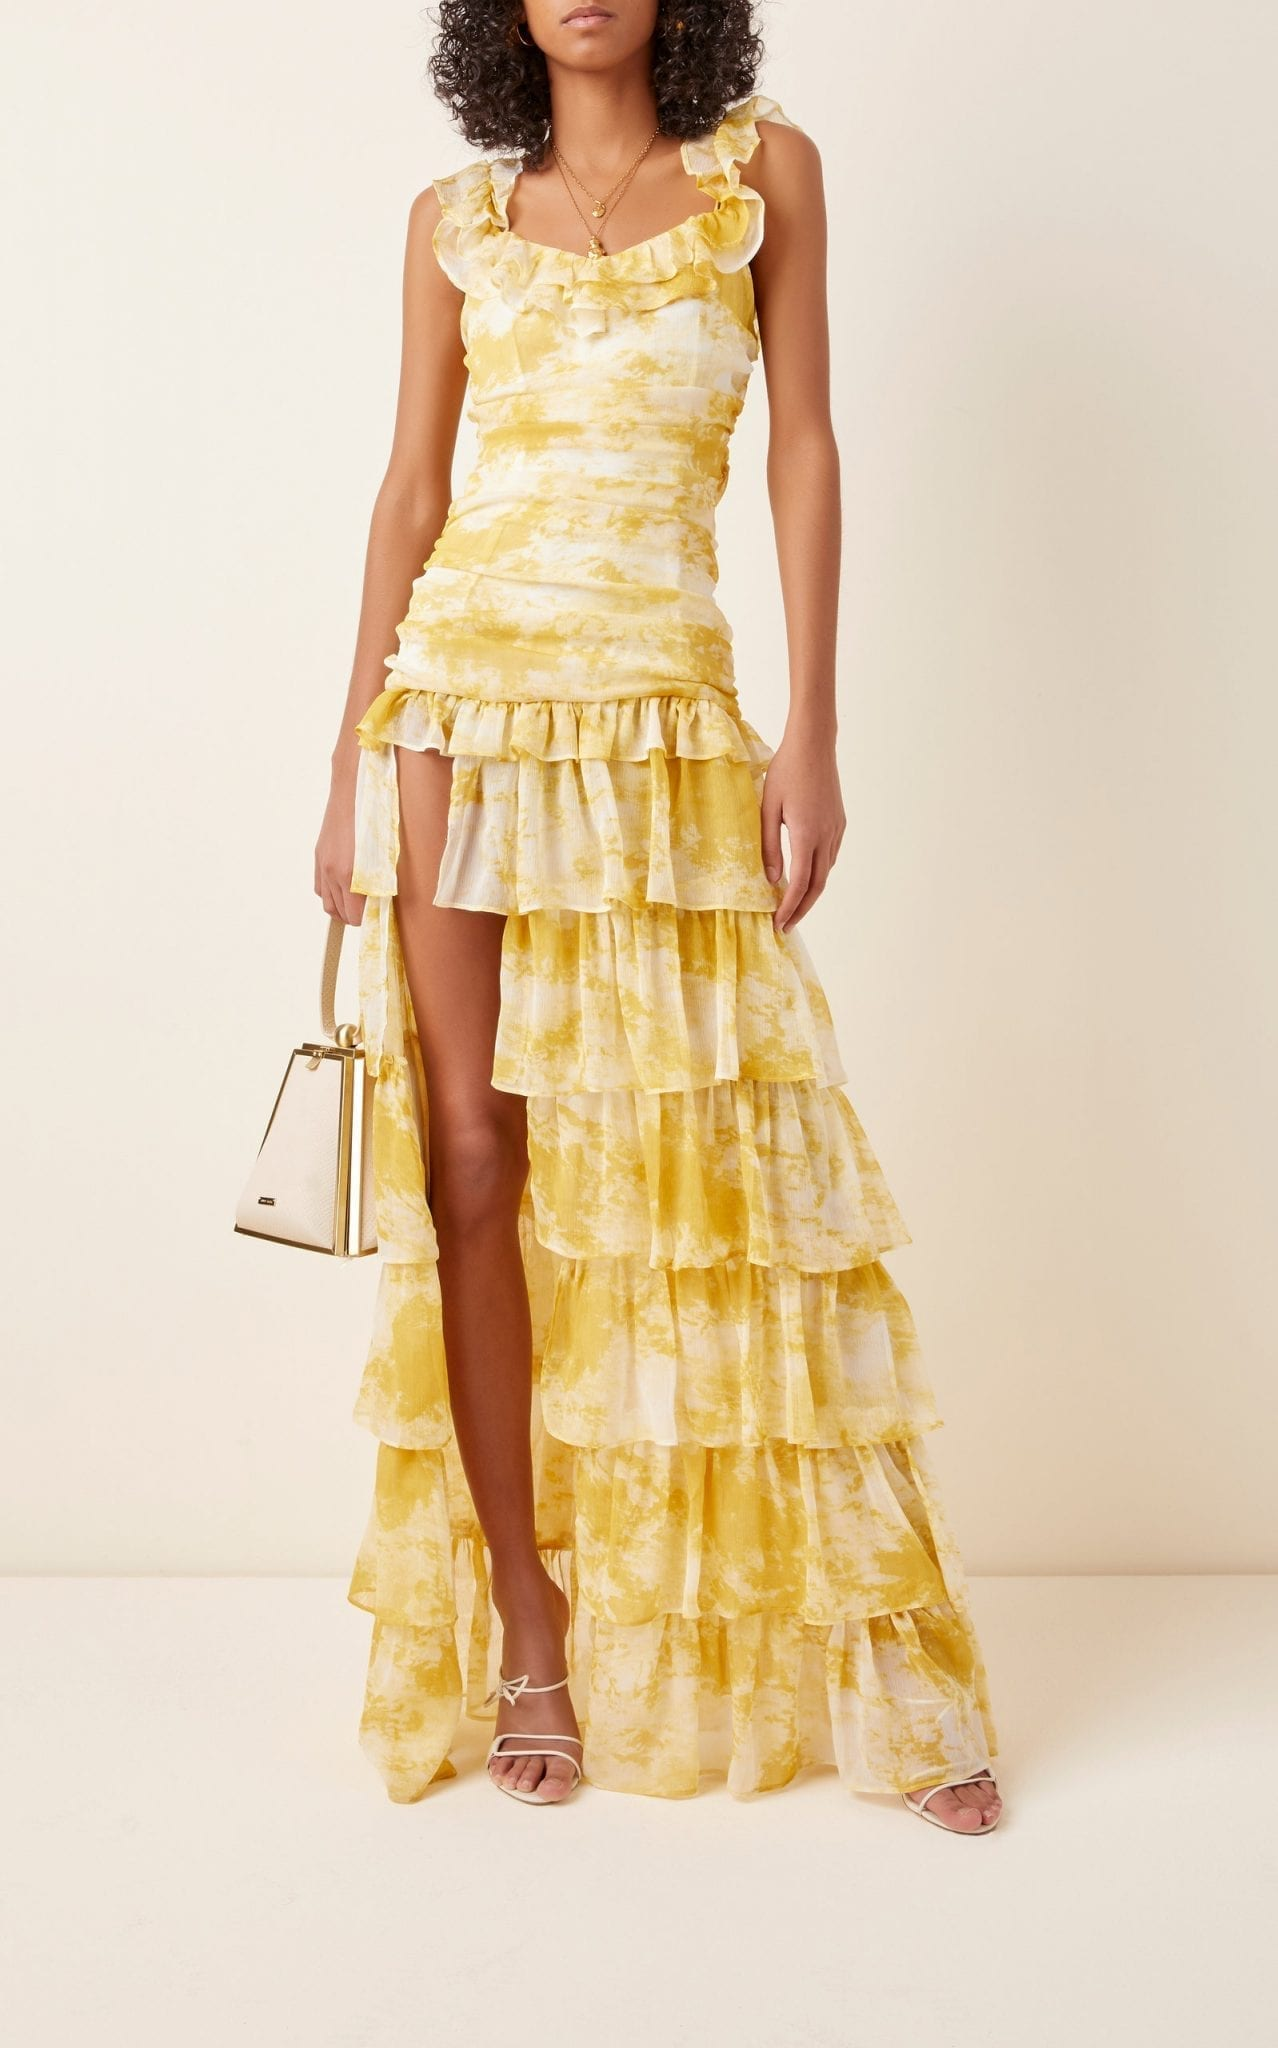 ATOIR Back To Love Tiered Ruffle Chiffon Dress